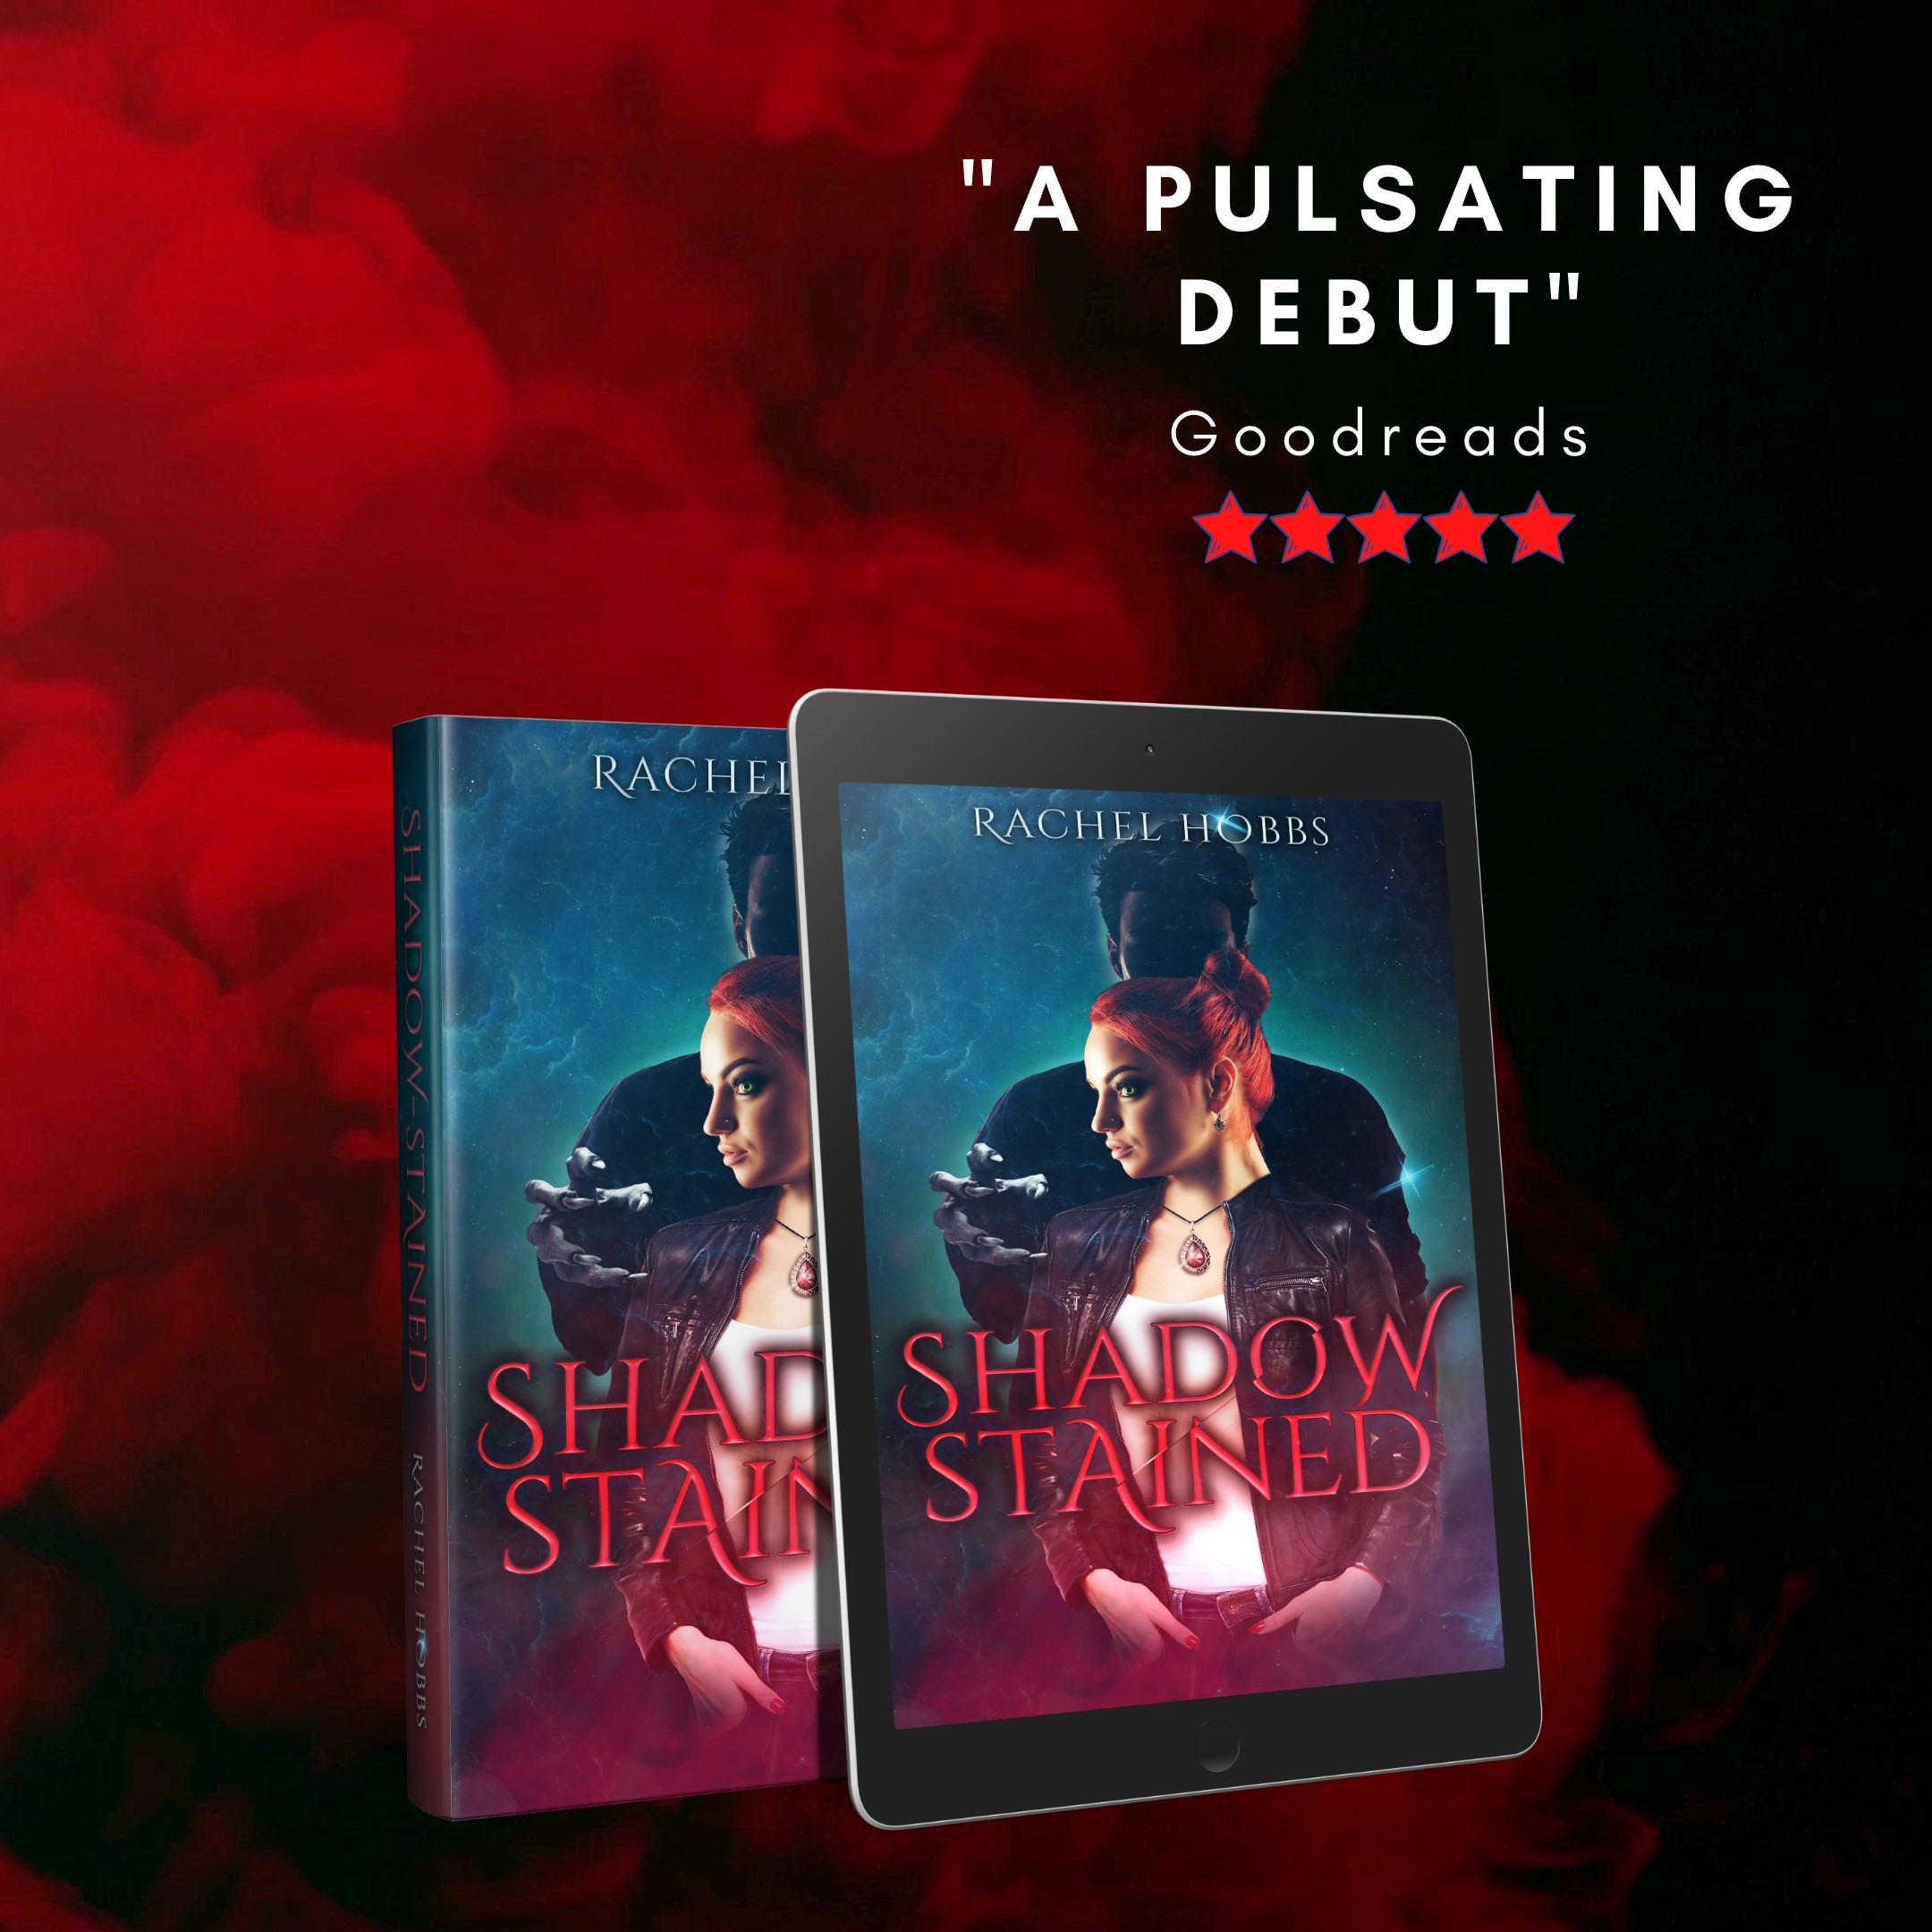 Red Pulsating Debut Promo copy